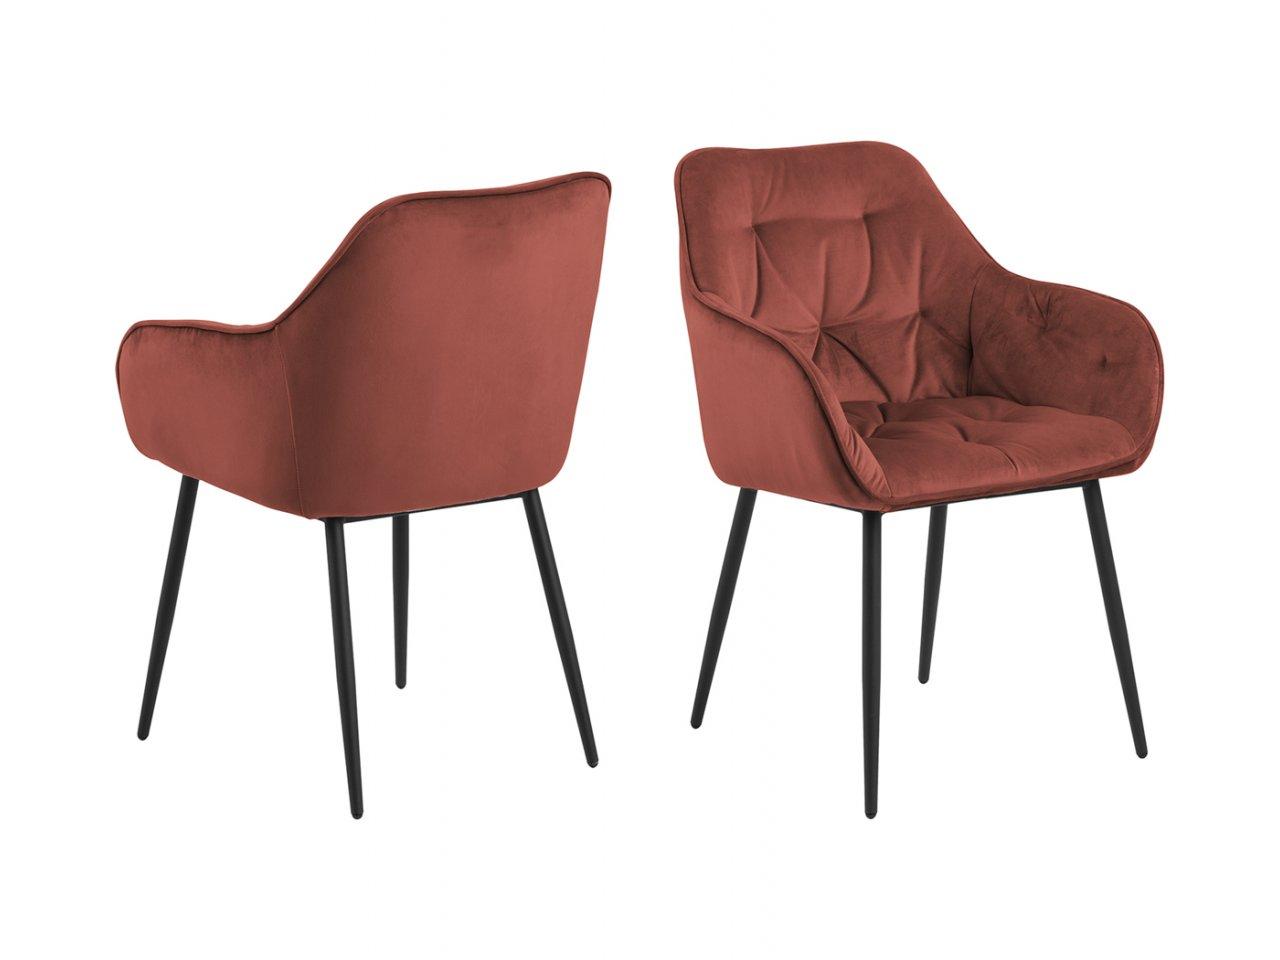 Sedia con braccioli Poffabro -5